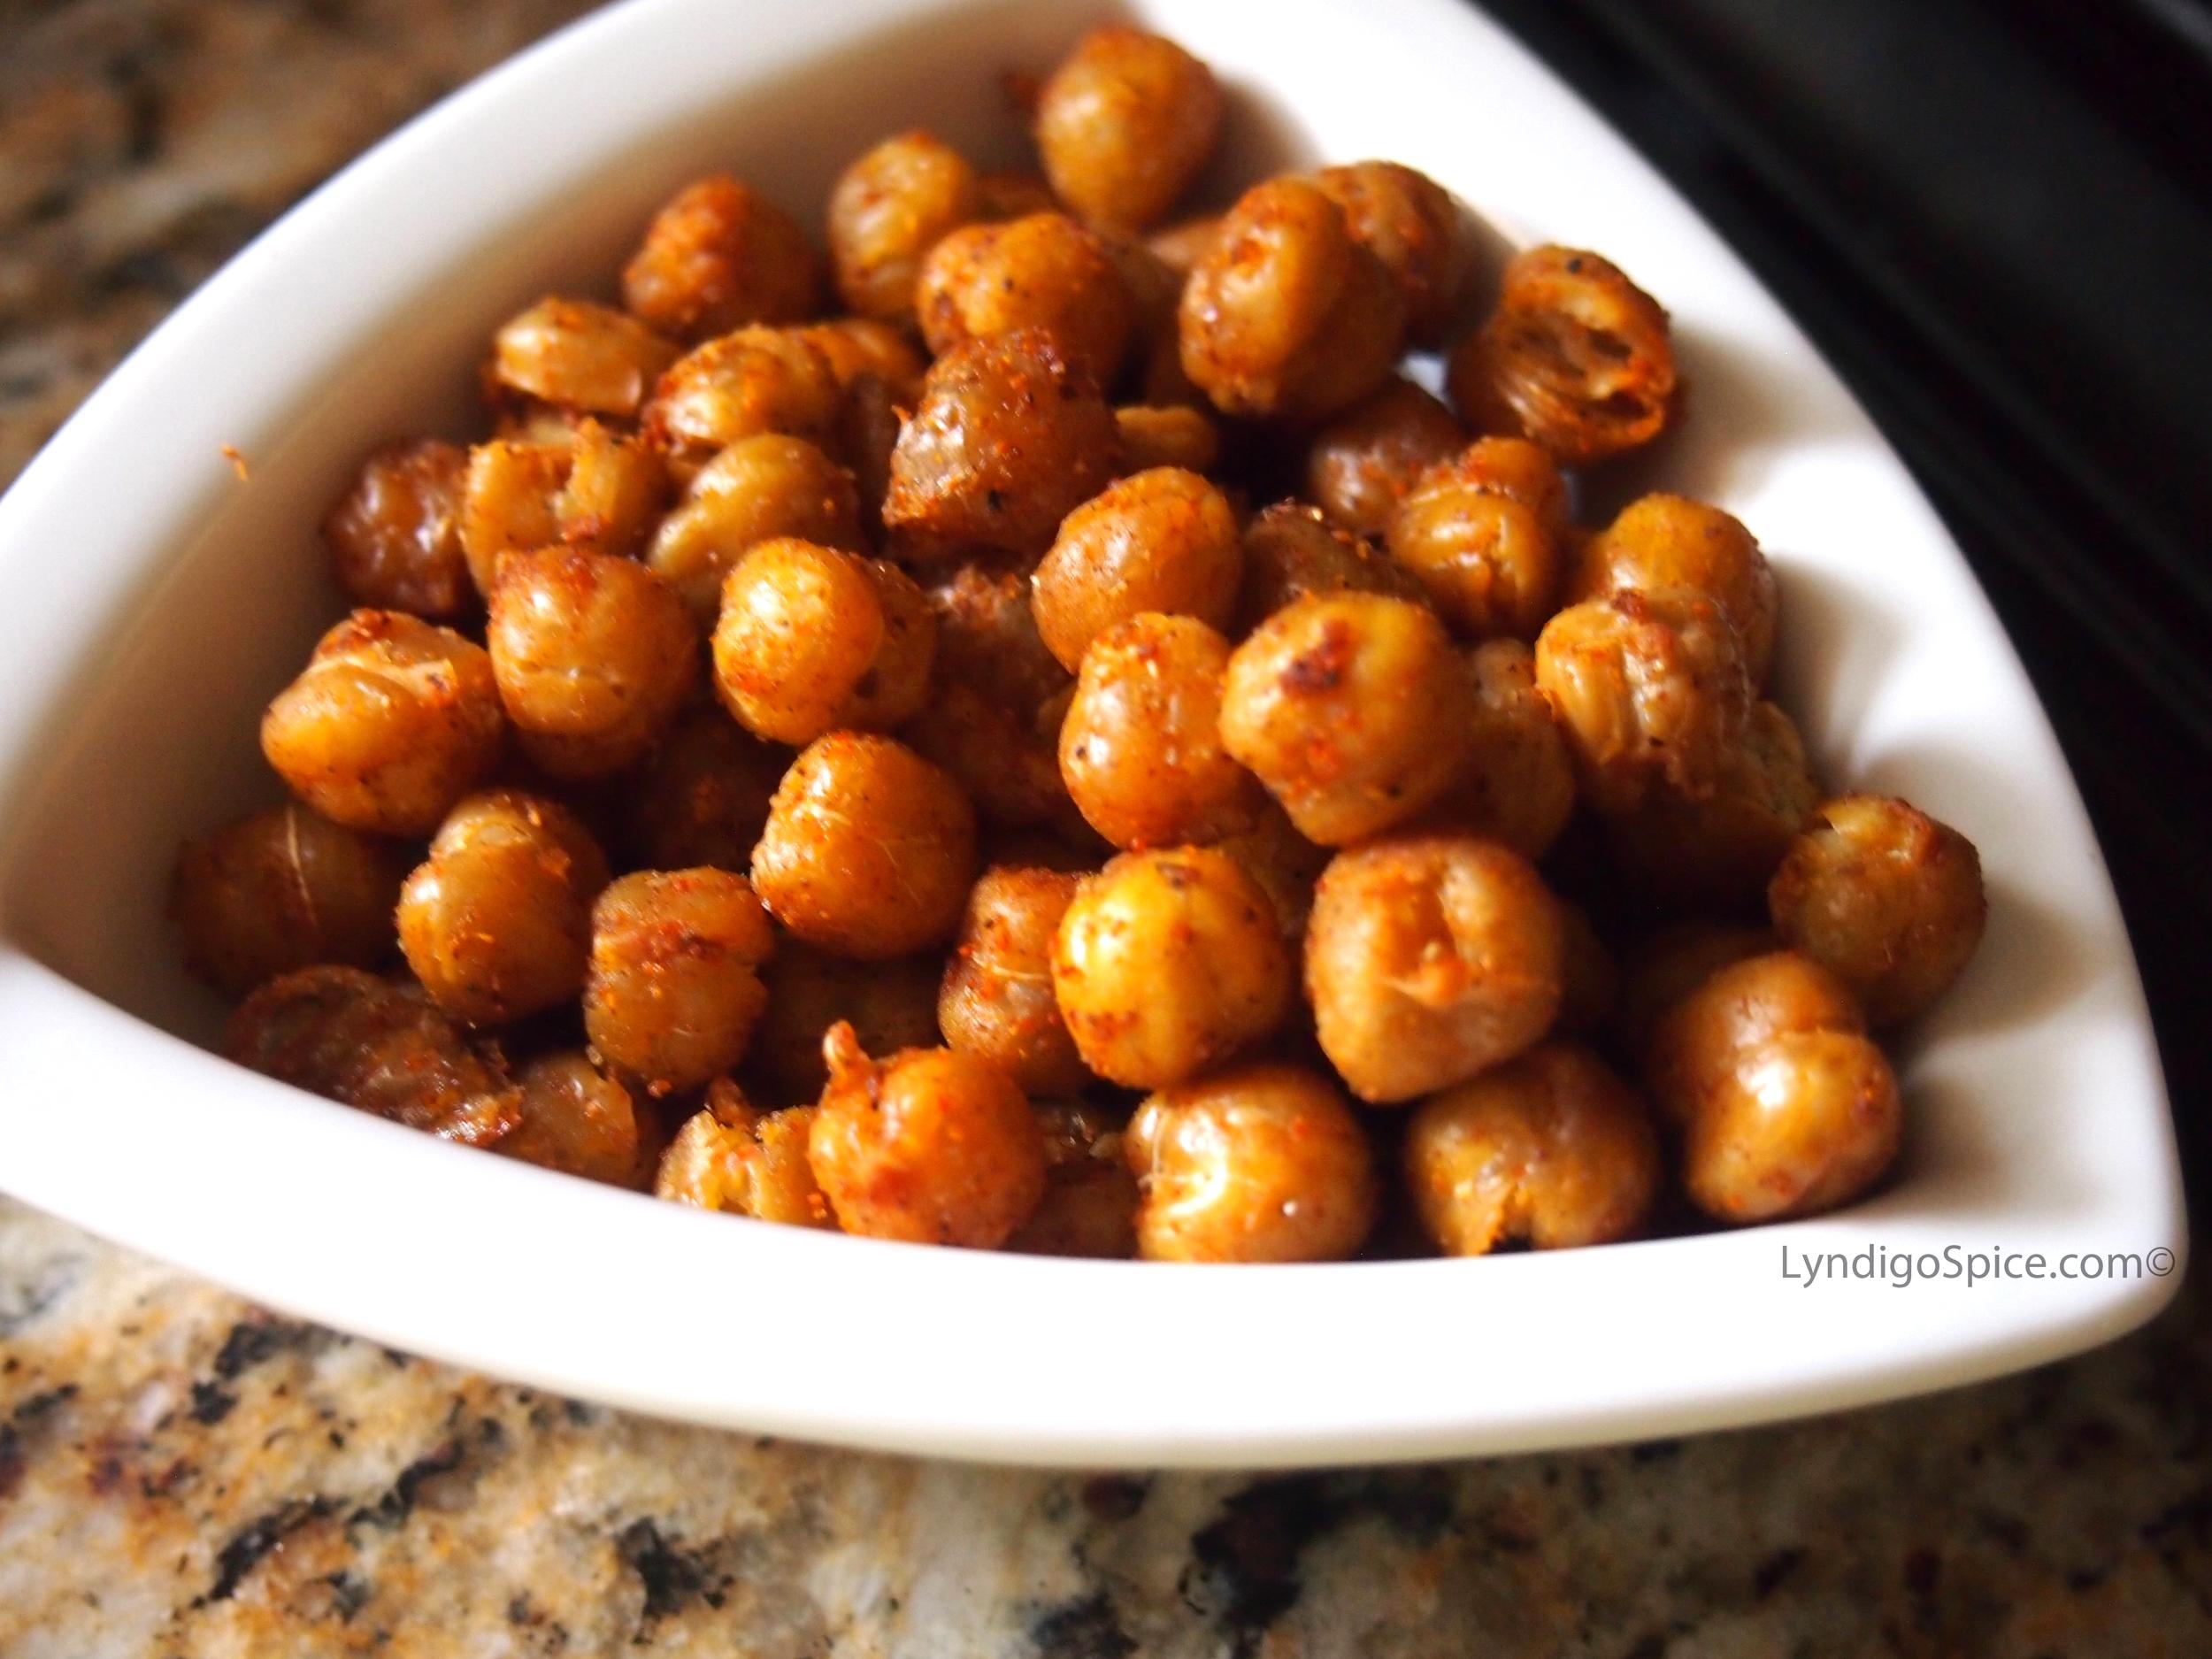 Lyndigo Spice® Roasted Chickpeas